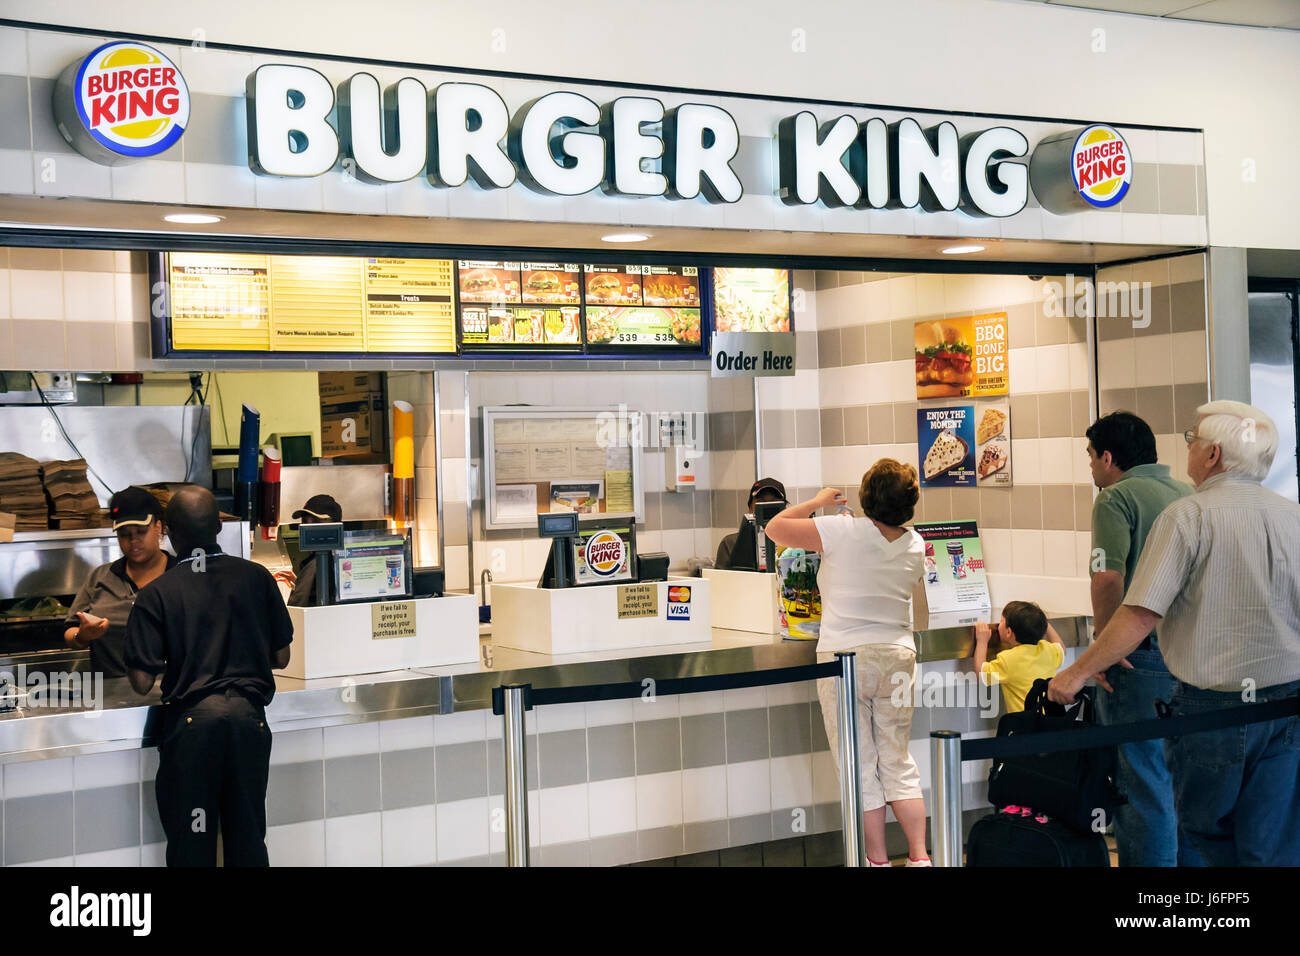 Atlanta Georgia Hartsfield-Jackson Atlanta International Airport Burger King fast food concession cashier customer - Stock Image